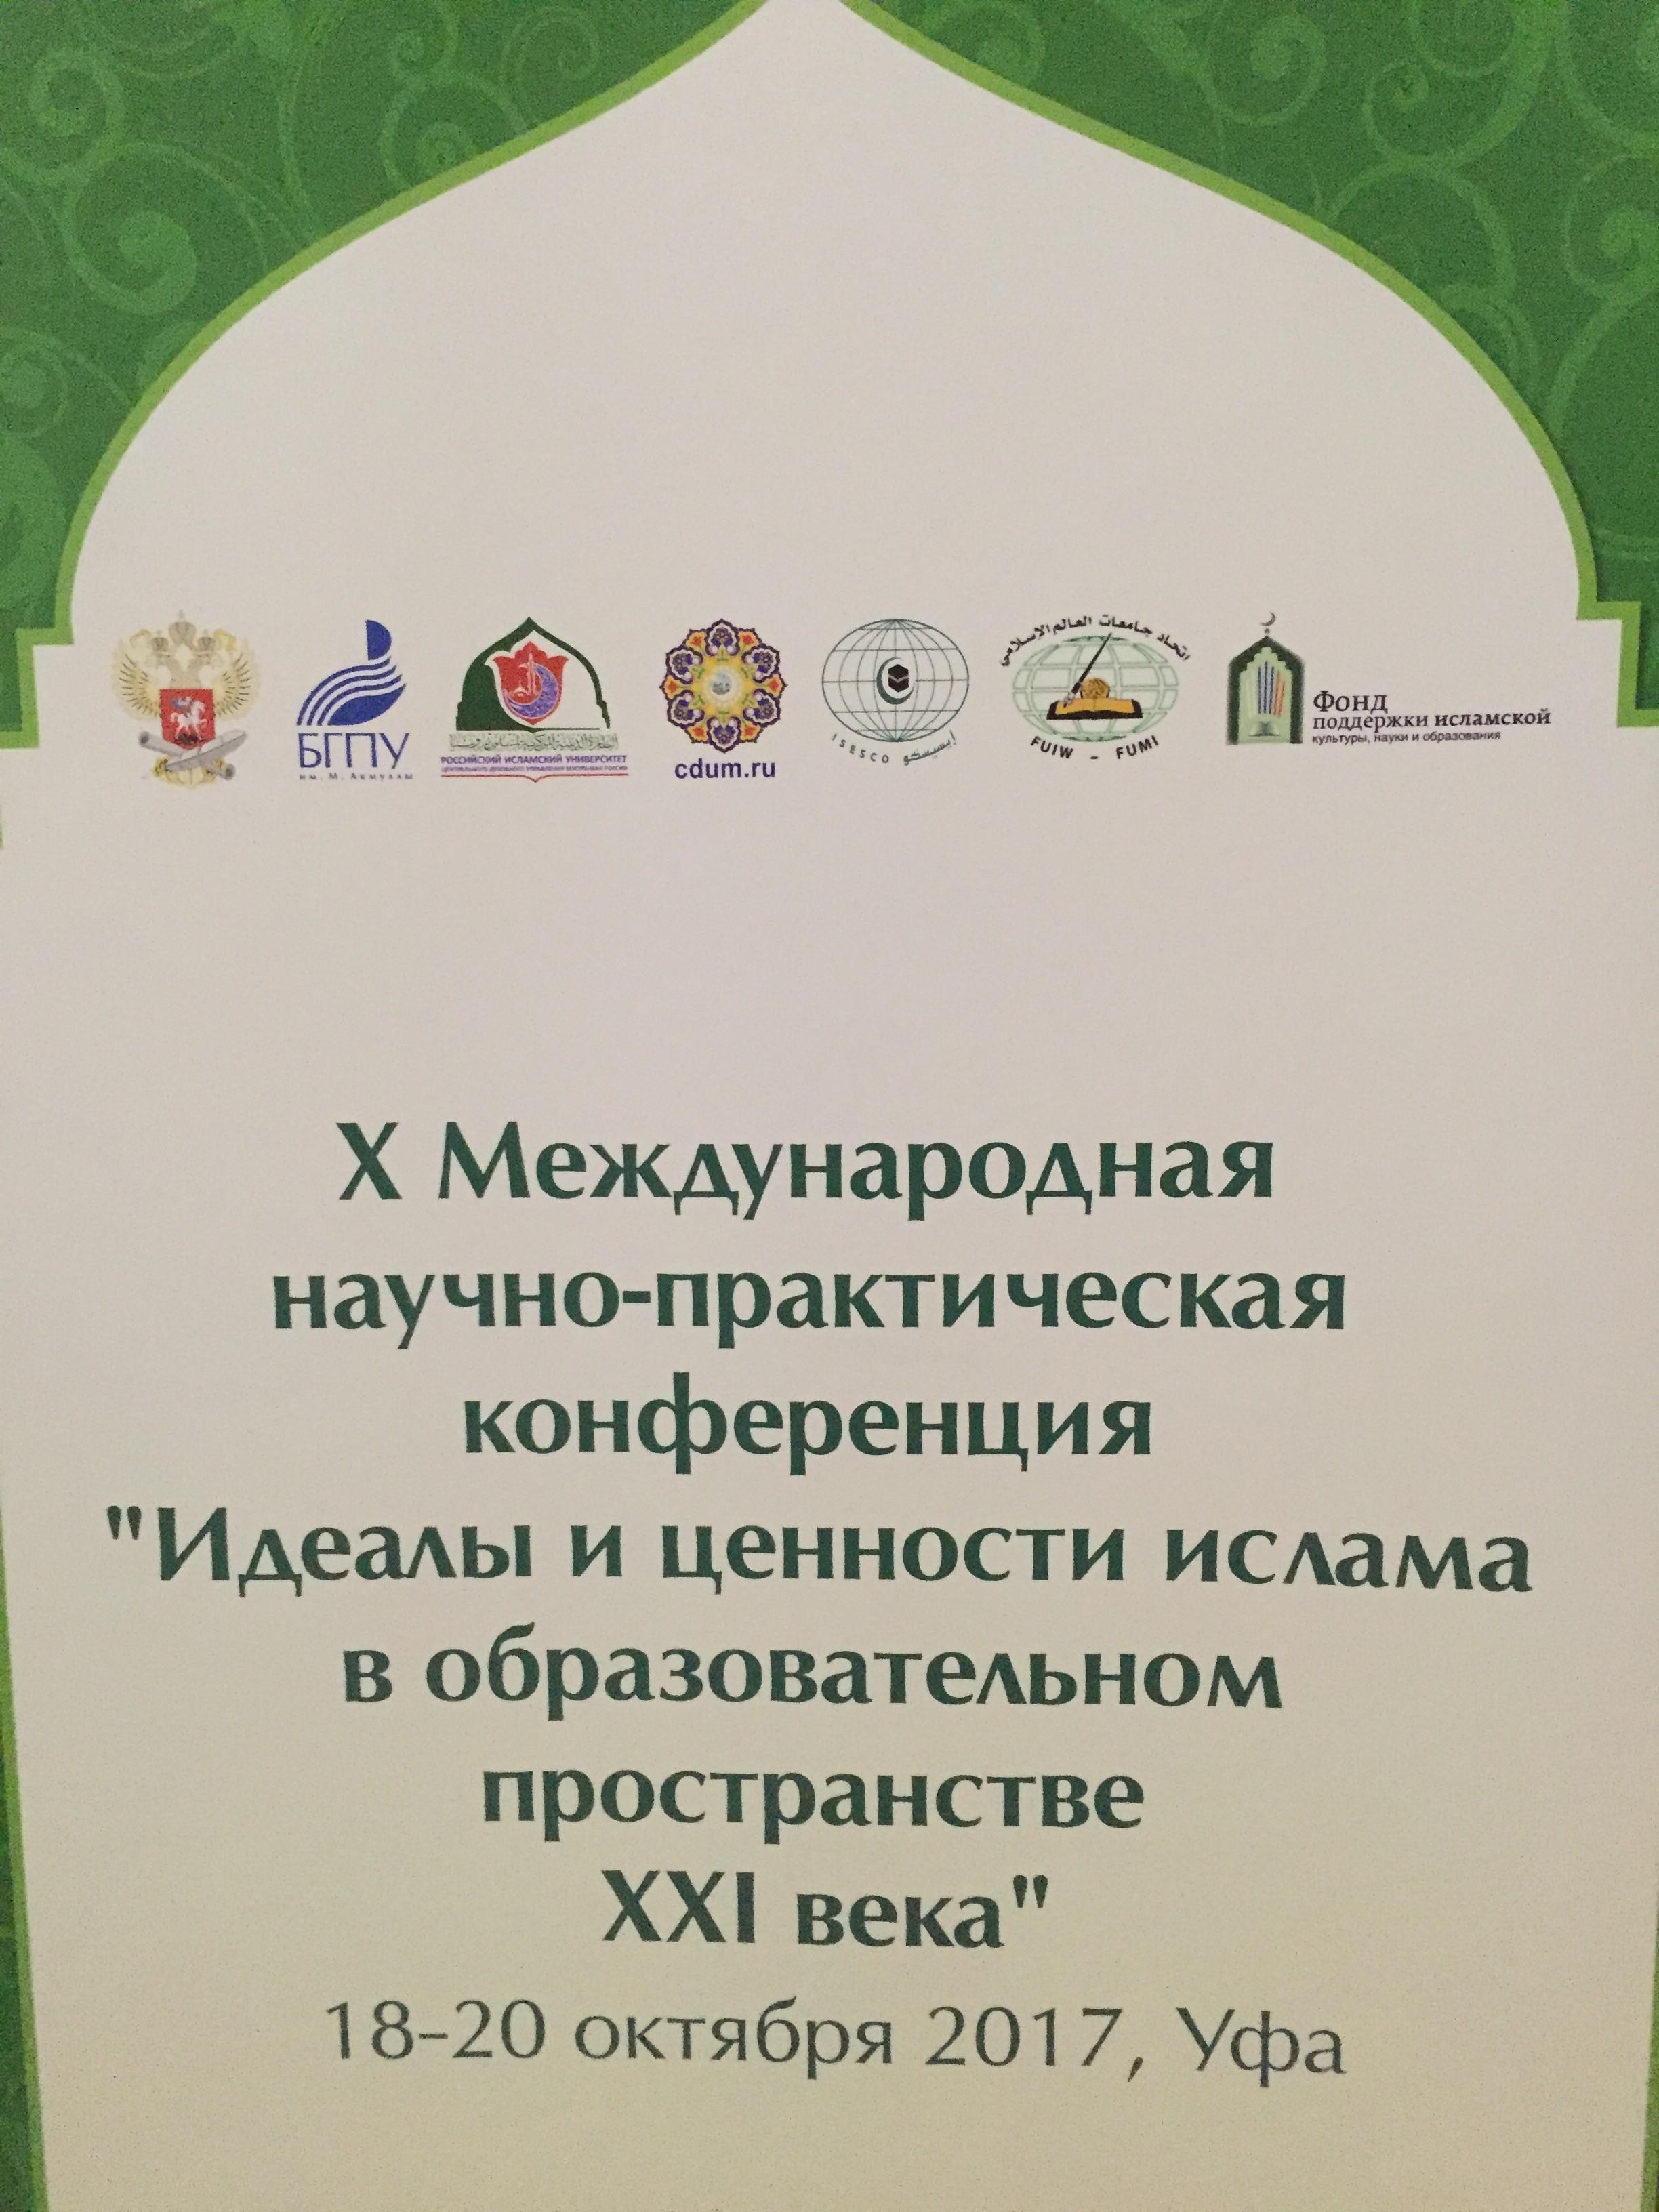 http://islamission.ru/wp-content/uploads/2017/10/IMG_3505-e1508866532119.jpg